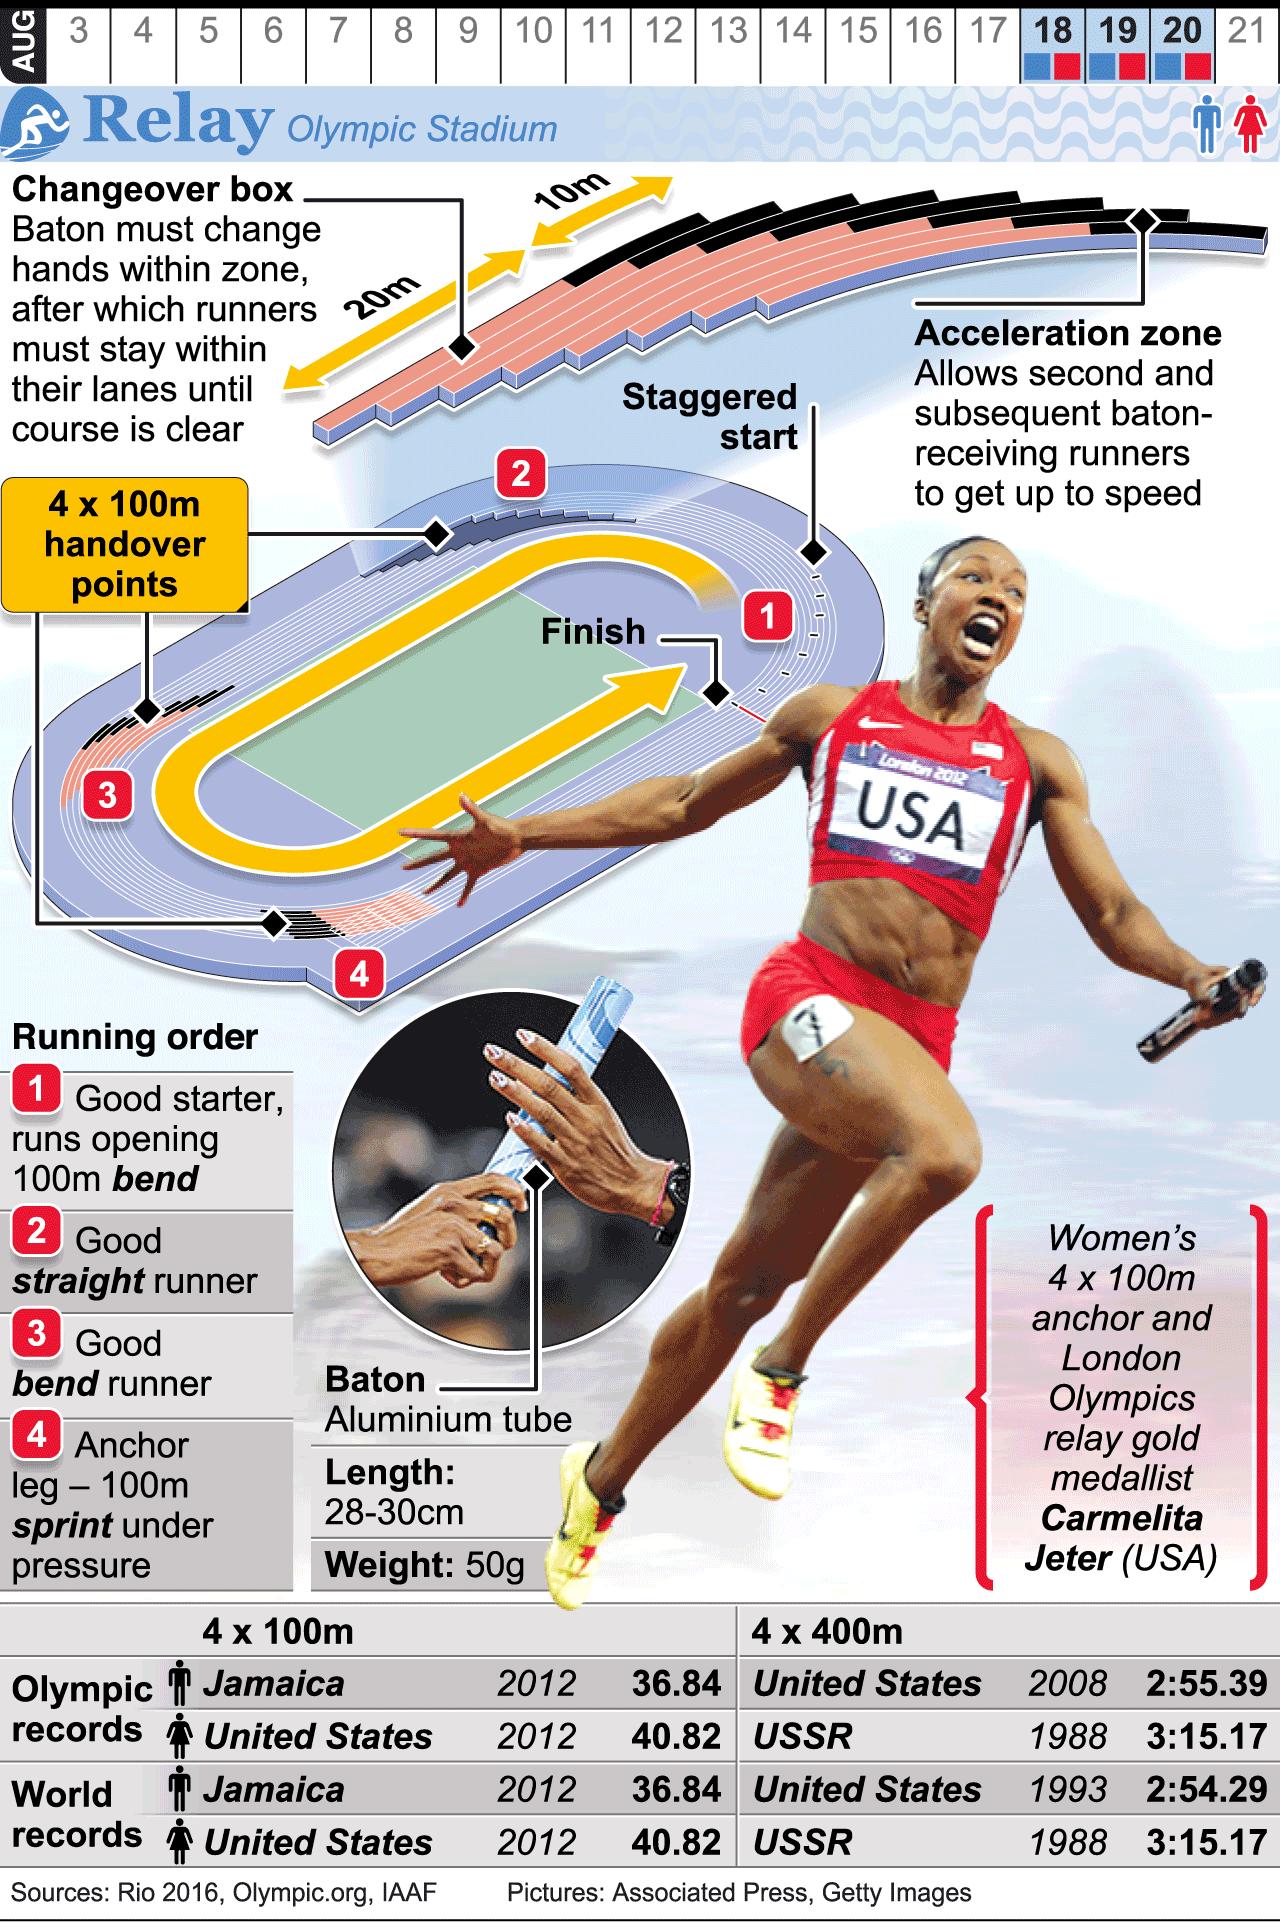 RIO 2016 Olympic Relay infographic Olympics, Rio